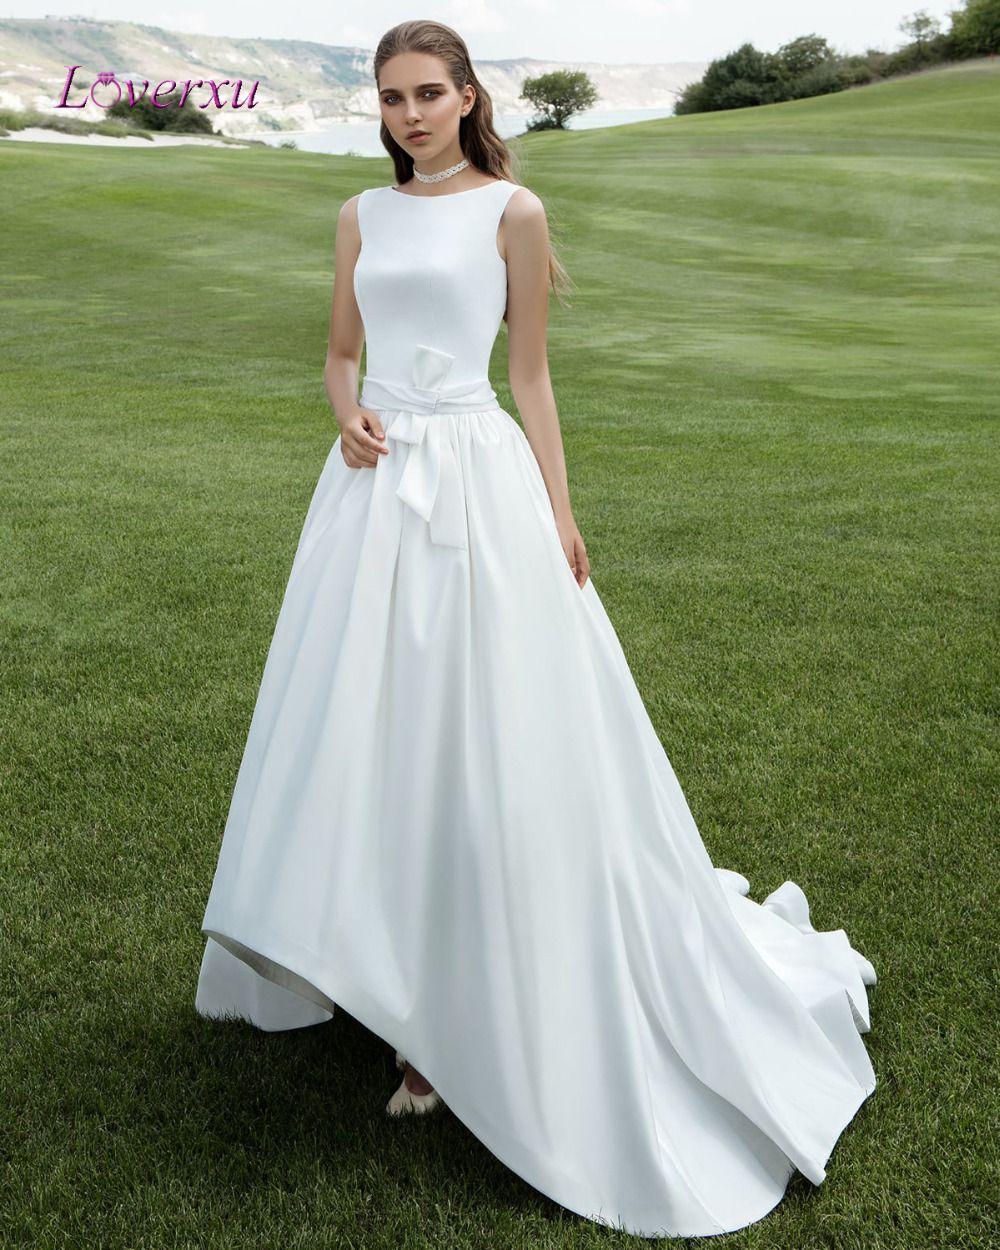 Loverxu fashionable matte satin high low wedding dresses luxury